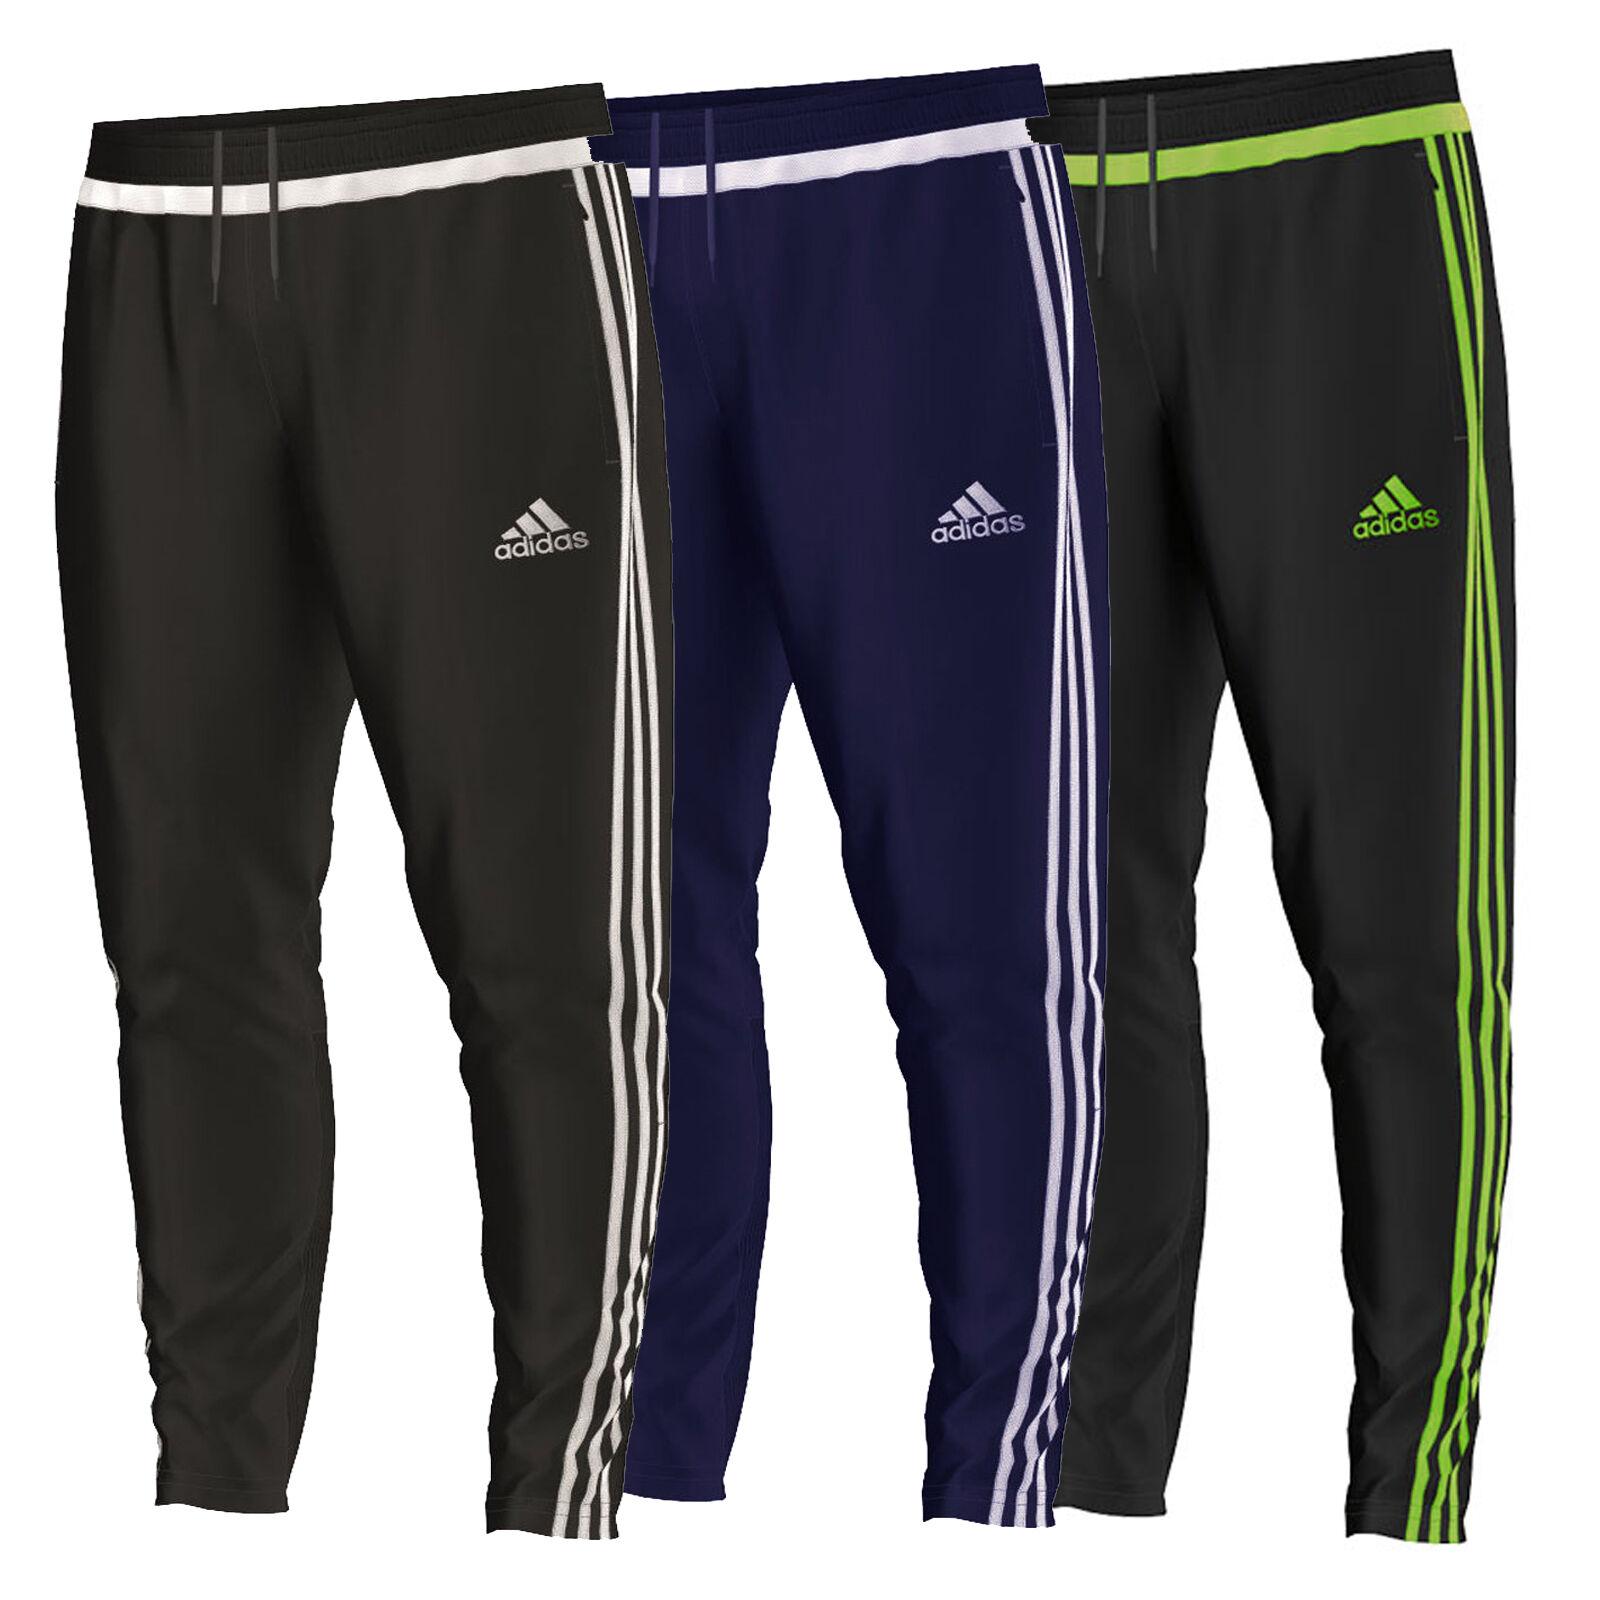 Adidas Detalles 15 Chándal Playeras Pantalones Tiro Hombre Nuevo De  Estrechos 557rvq 66119476d2a7